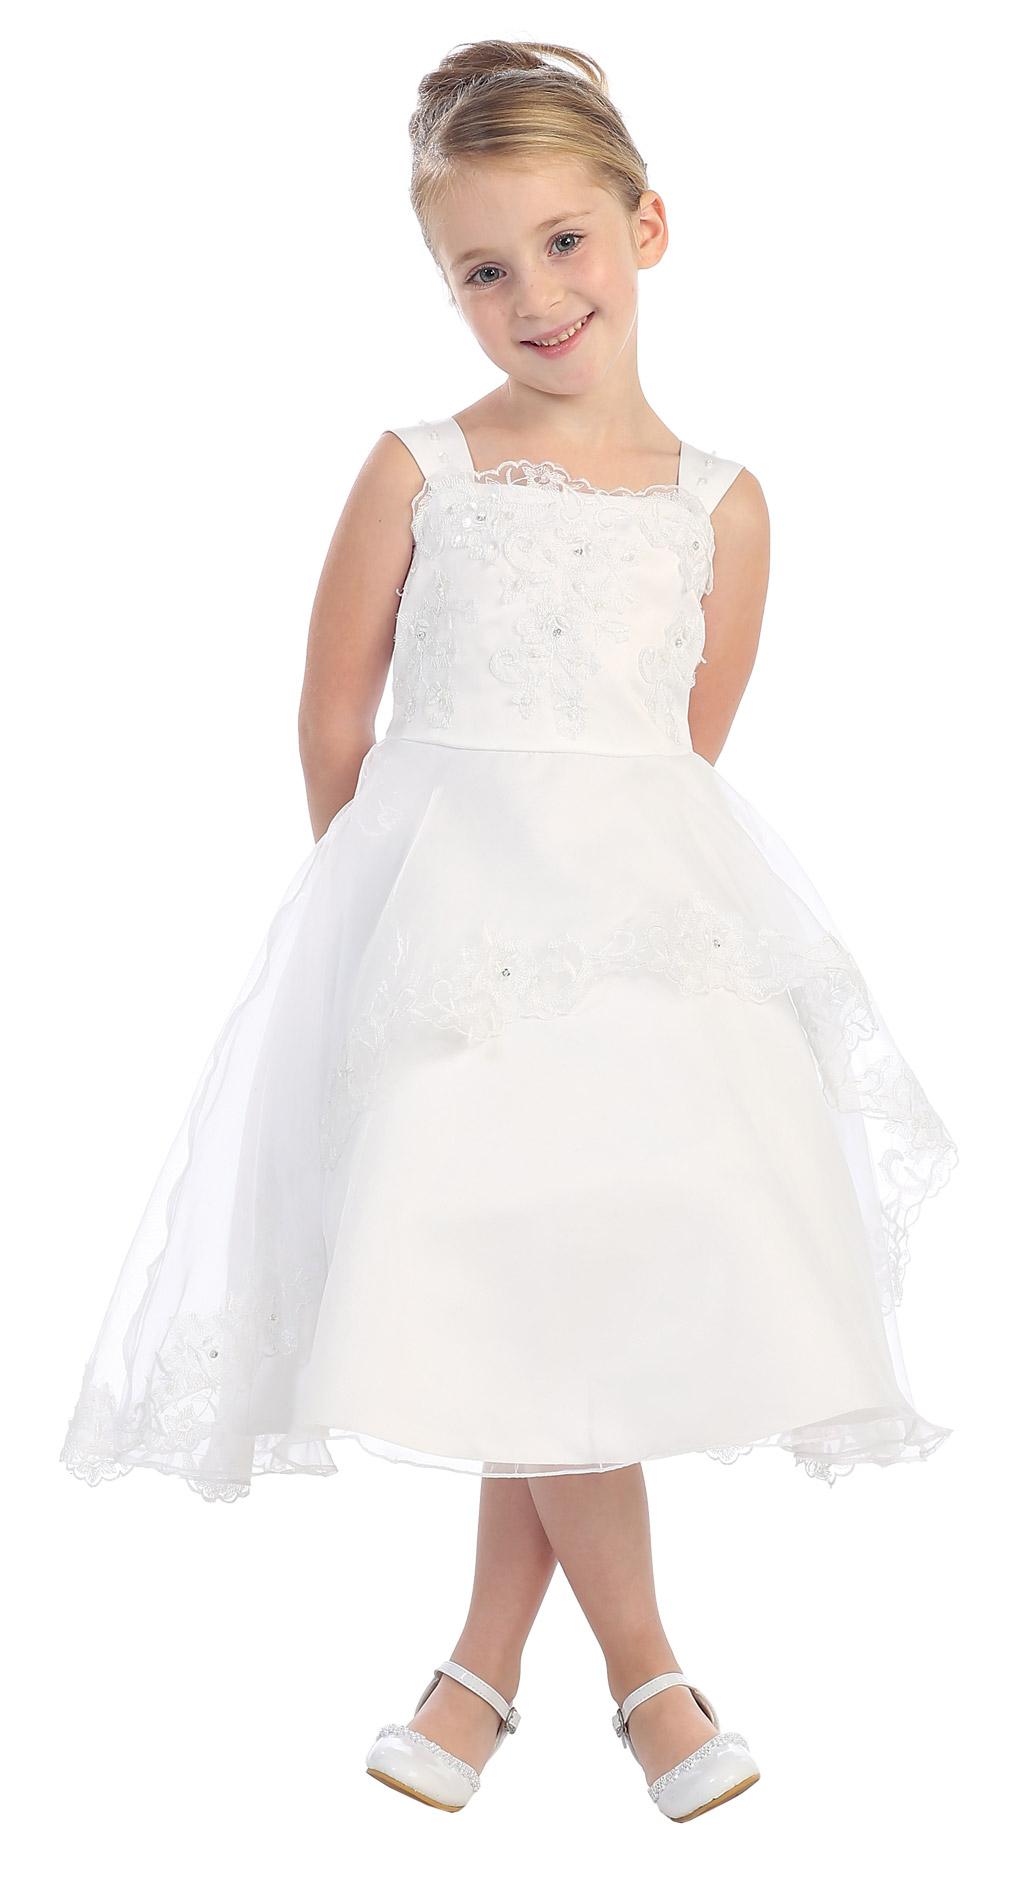 Tt 5552w Girls Dress Style 5552 Choice Of White Or